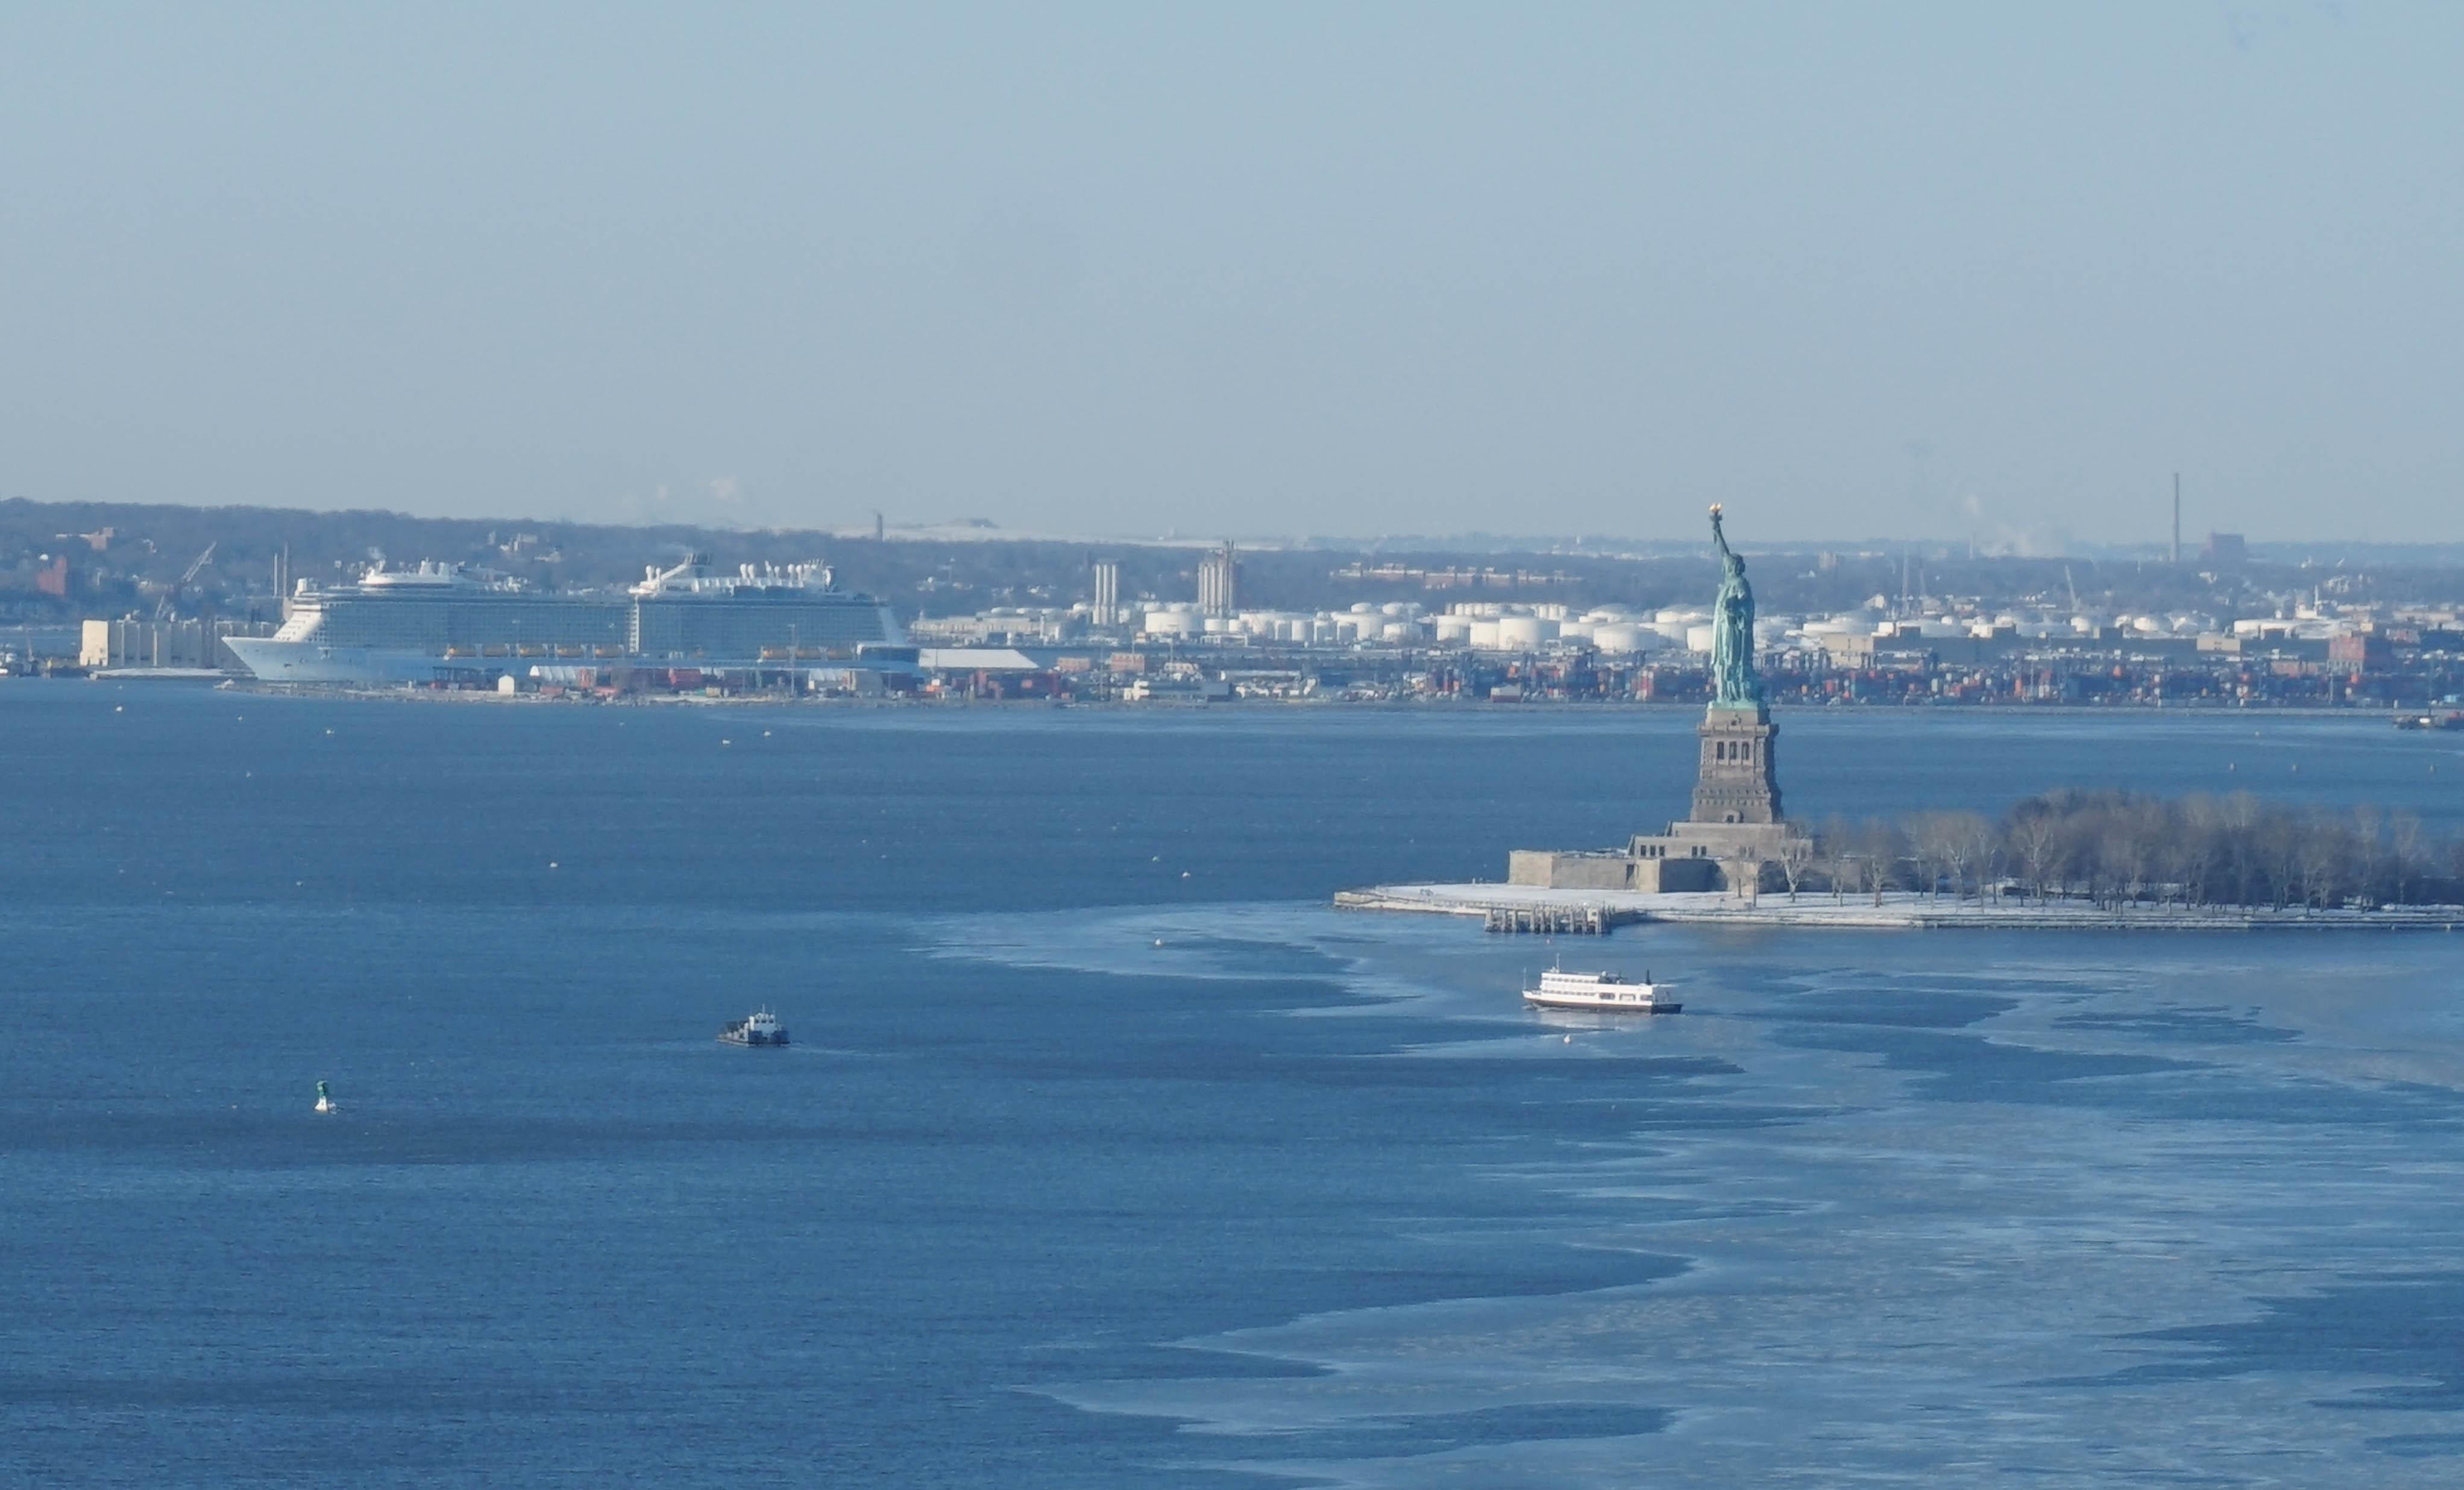 Cruise ship statue liberty ice 2-20-2015